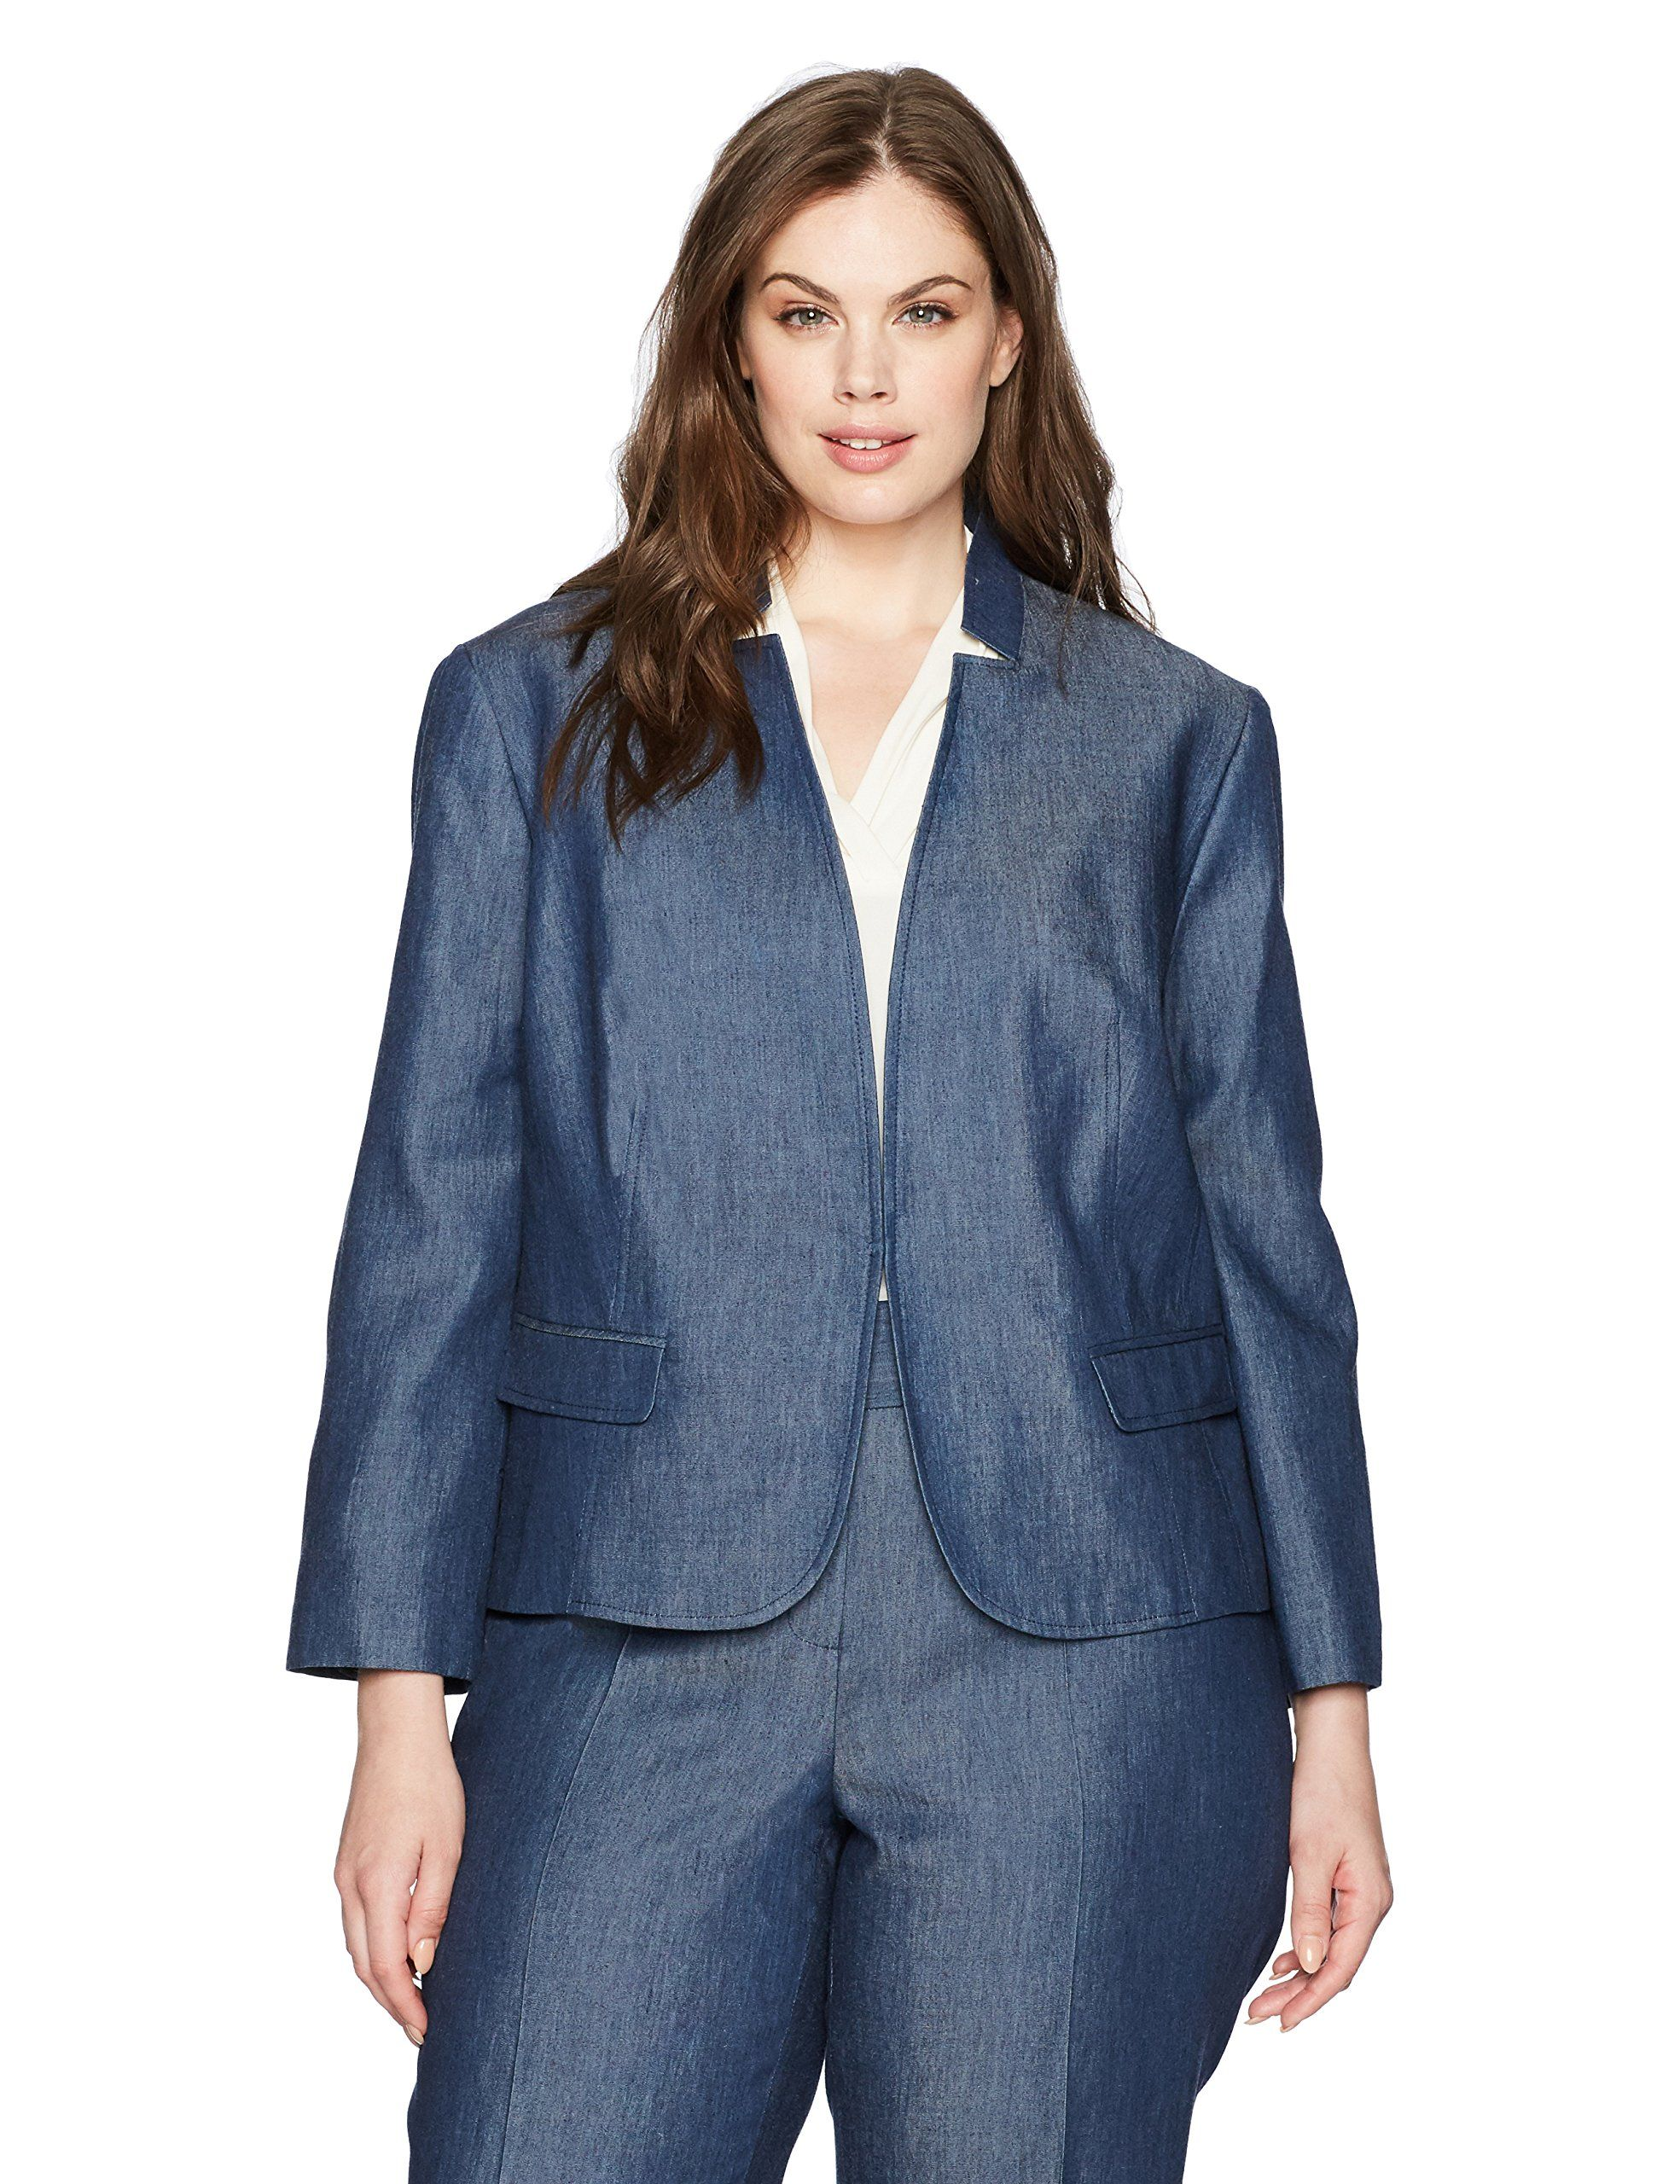 Nine West Women's Plus Size Kiss Front Jacket, Indigo, 14W